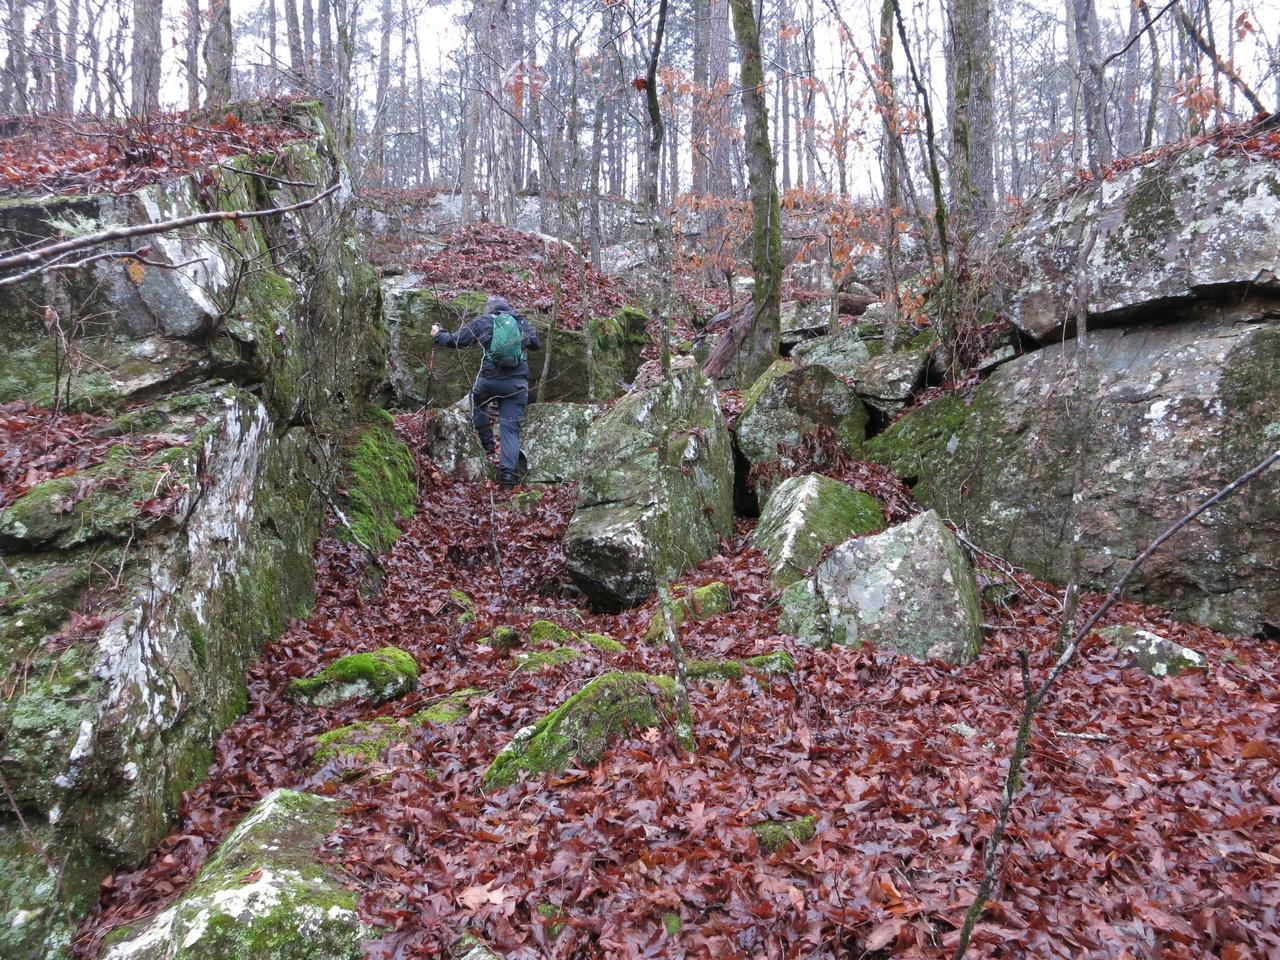 East Fork Wilderness The Compulsive Hiker